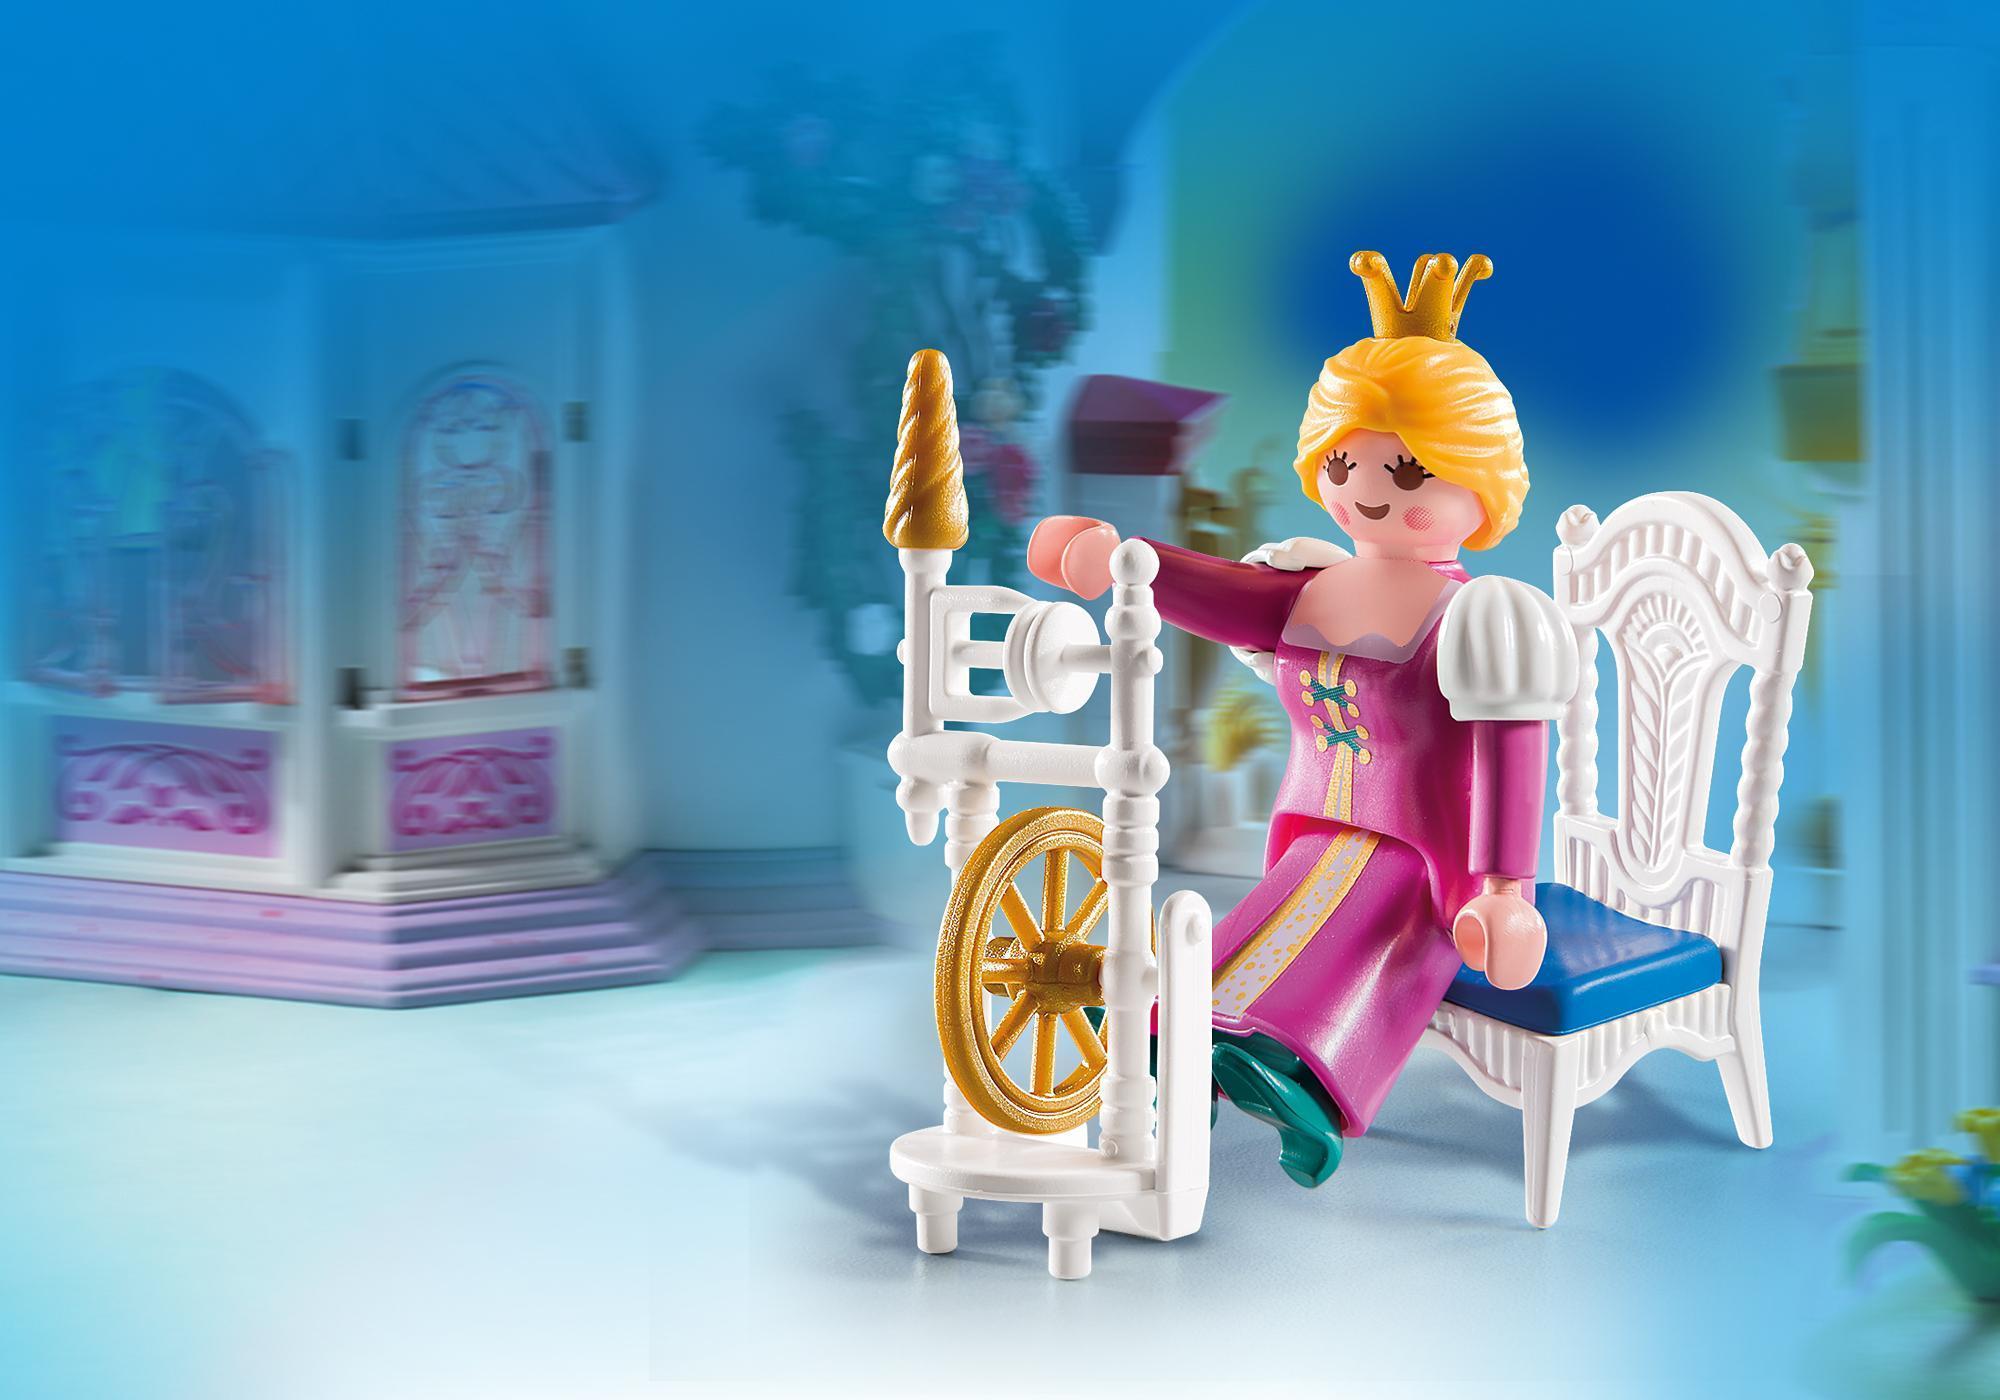 http://media.playmobil.com/i/playmobil/4790_product_detail/Принцесса с прялкой